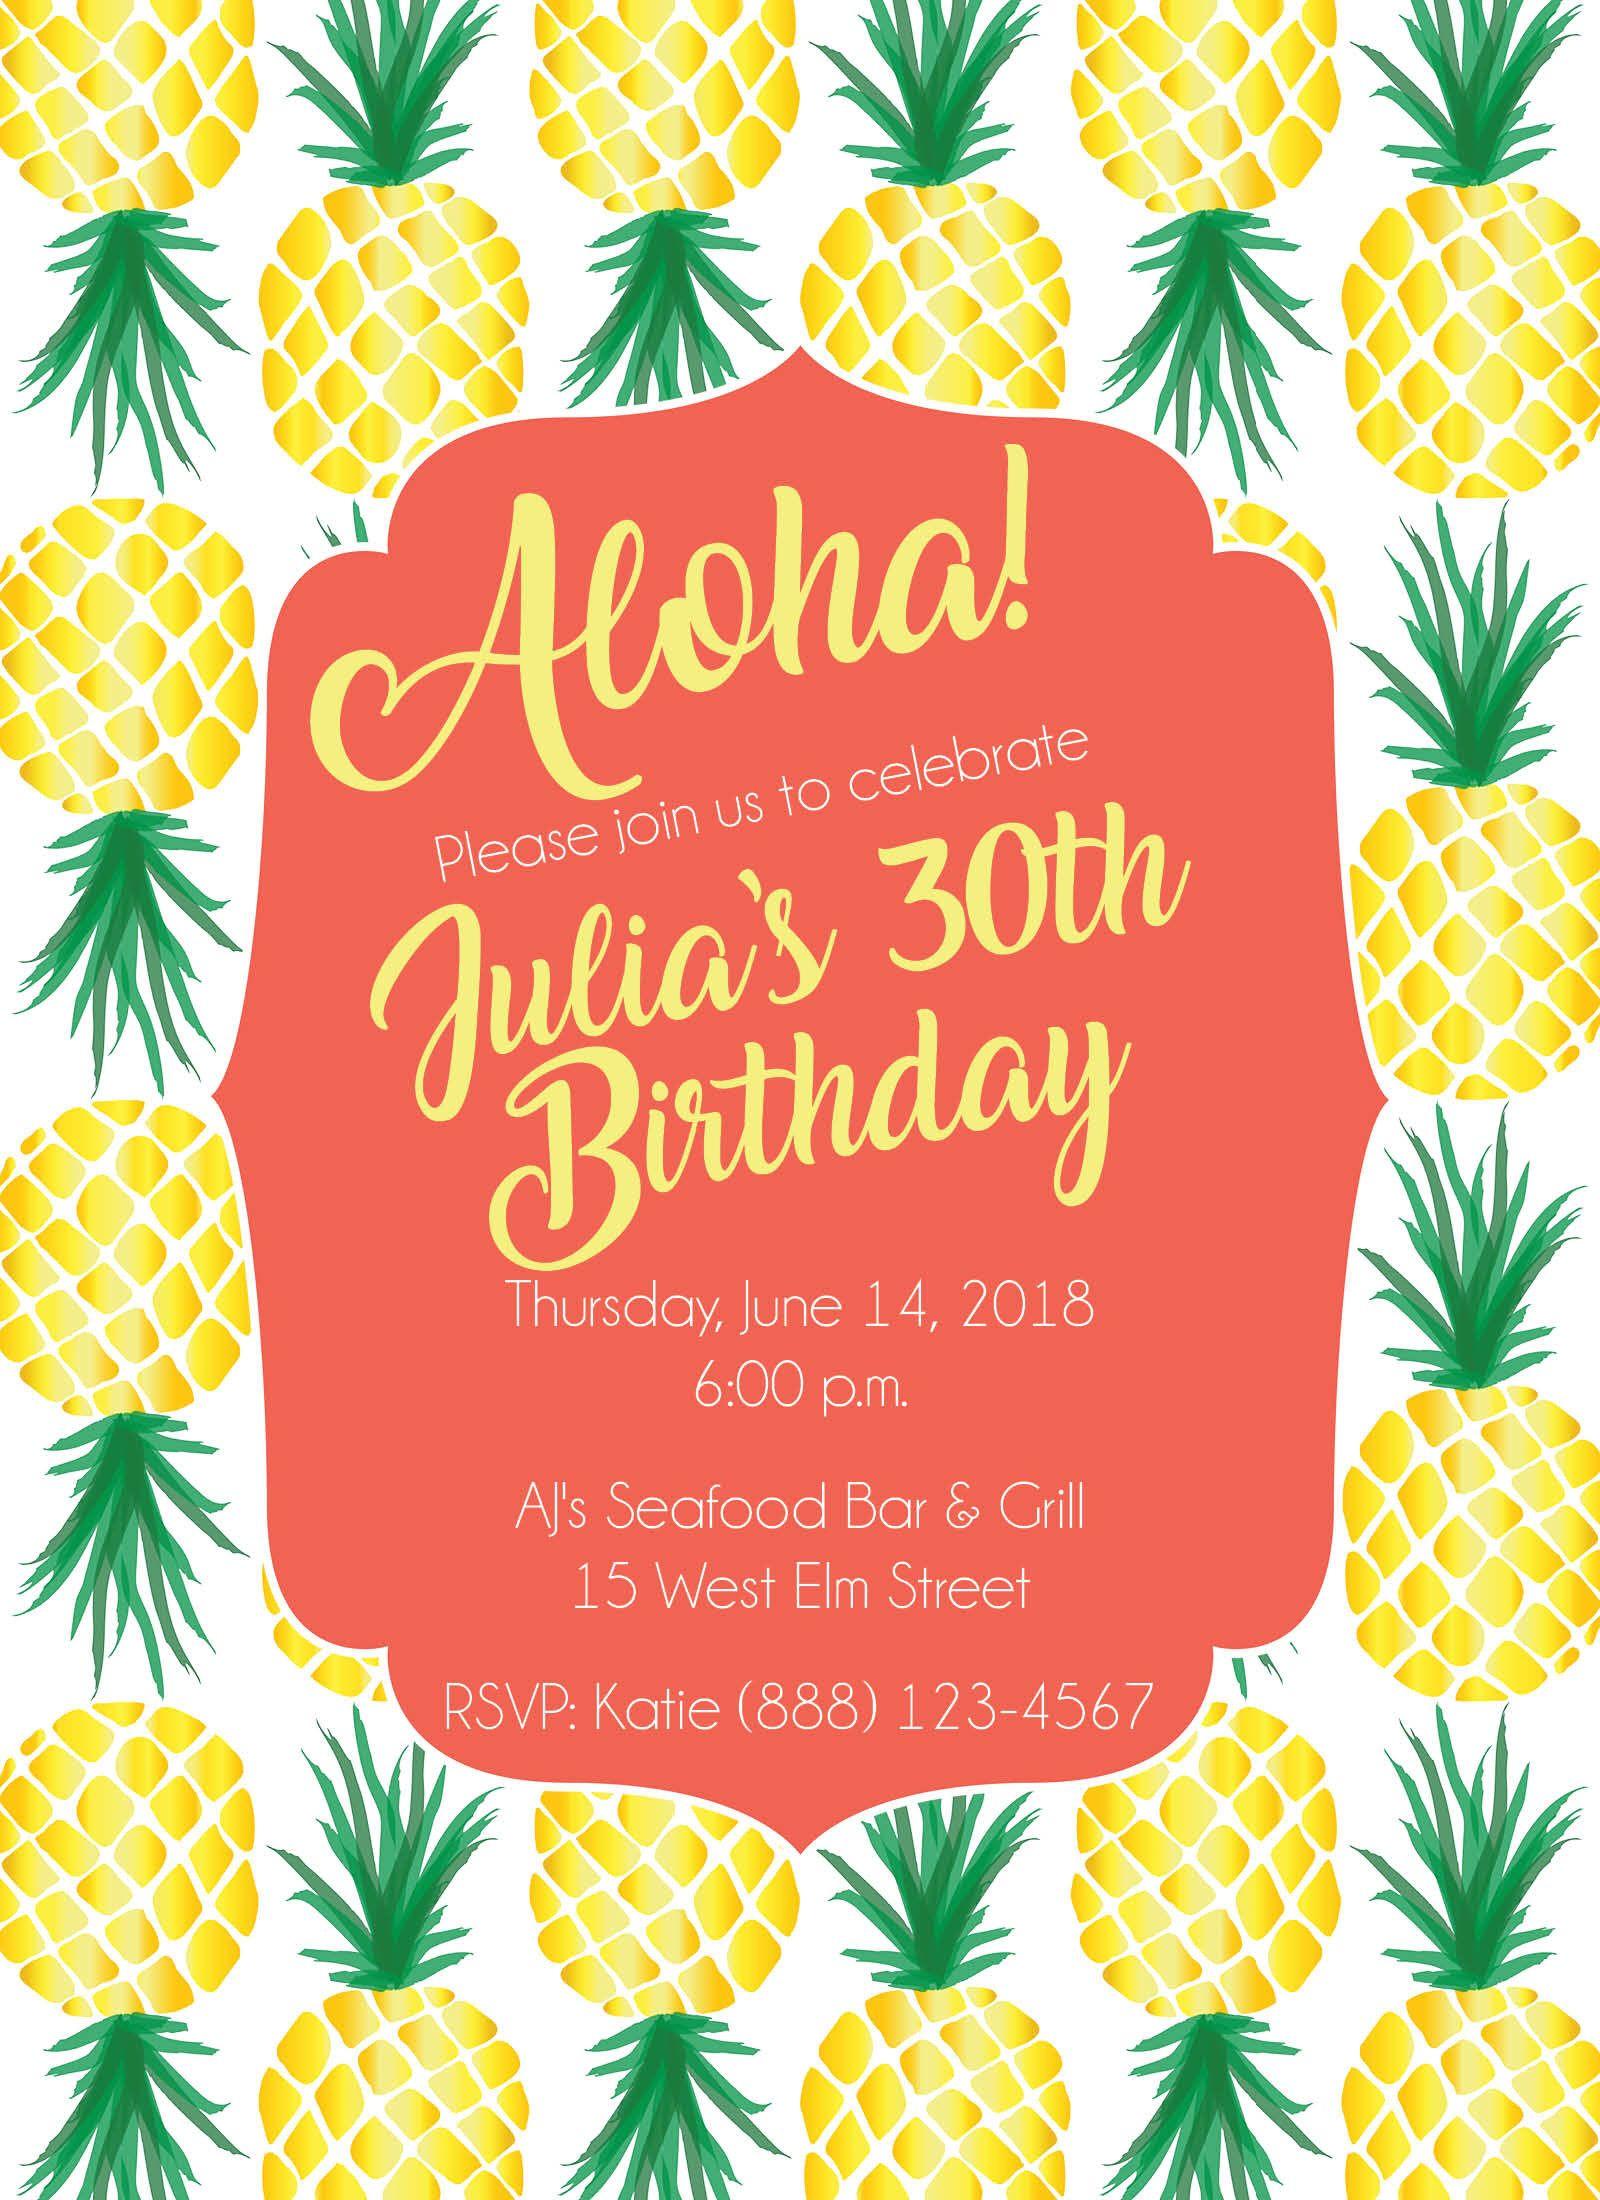 Pineapple Birthday Party Invitation - Tropical - Aloha - Customized ...